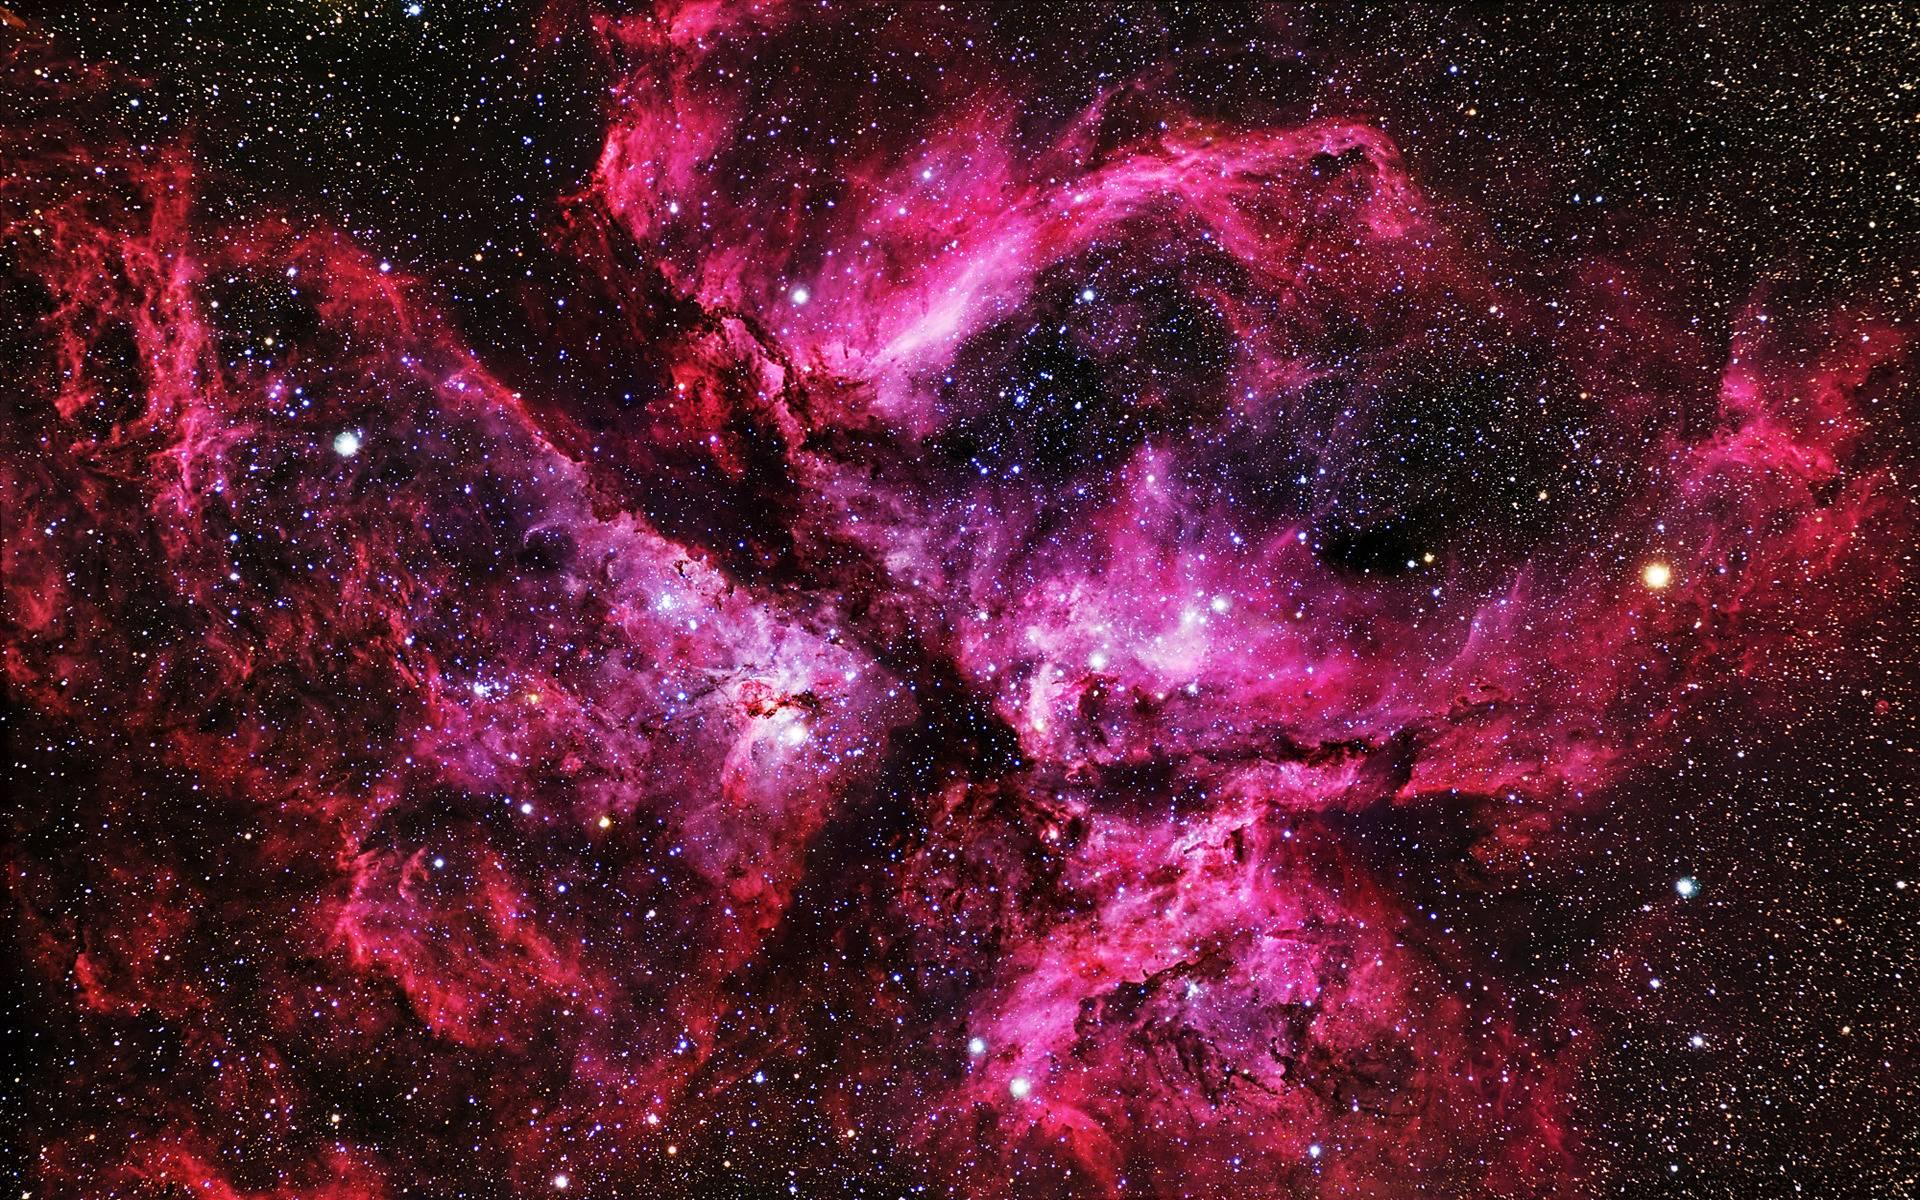 galaxy tumblr background hd - photo #21